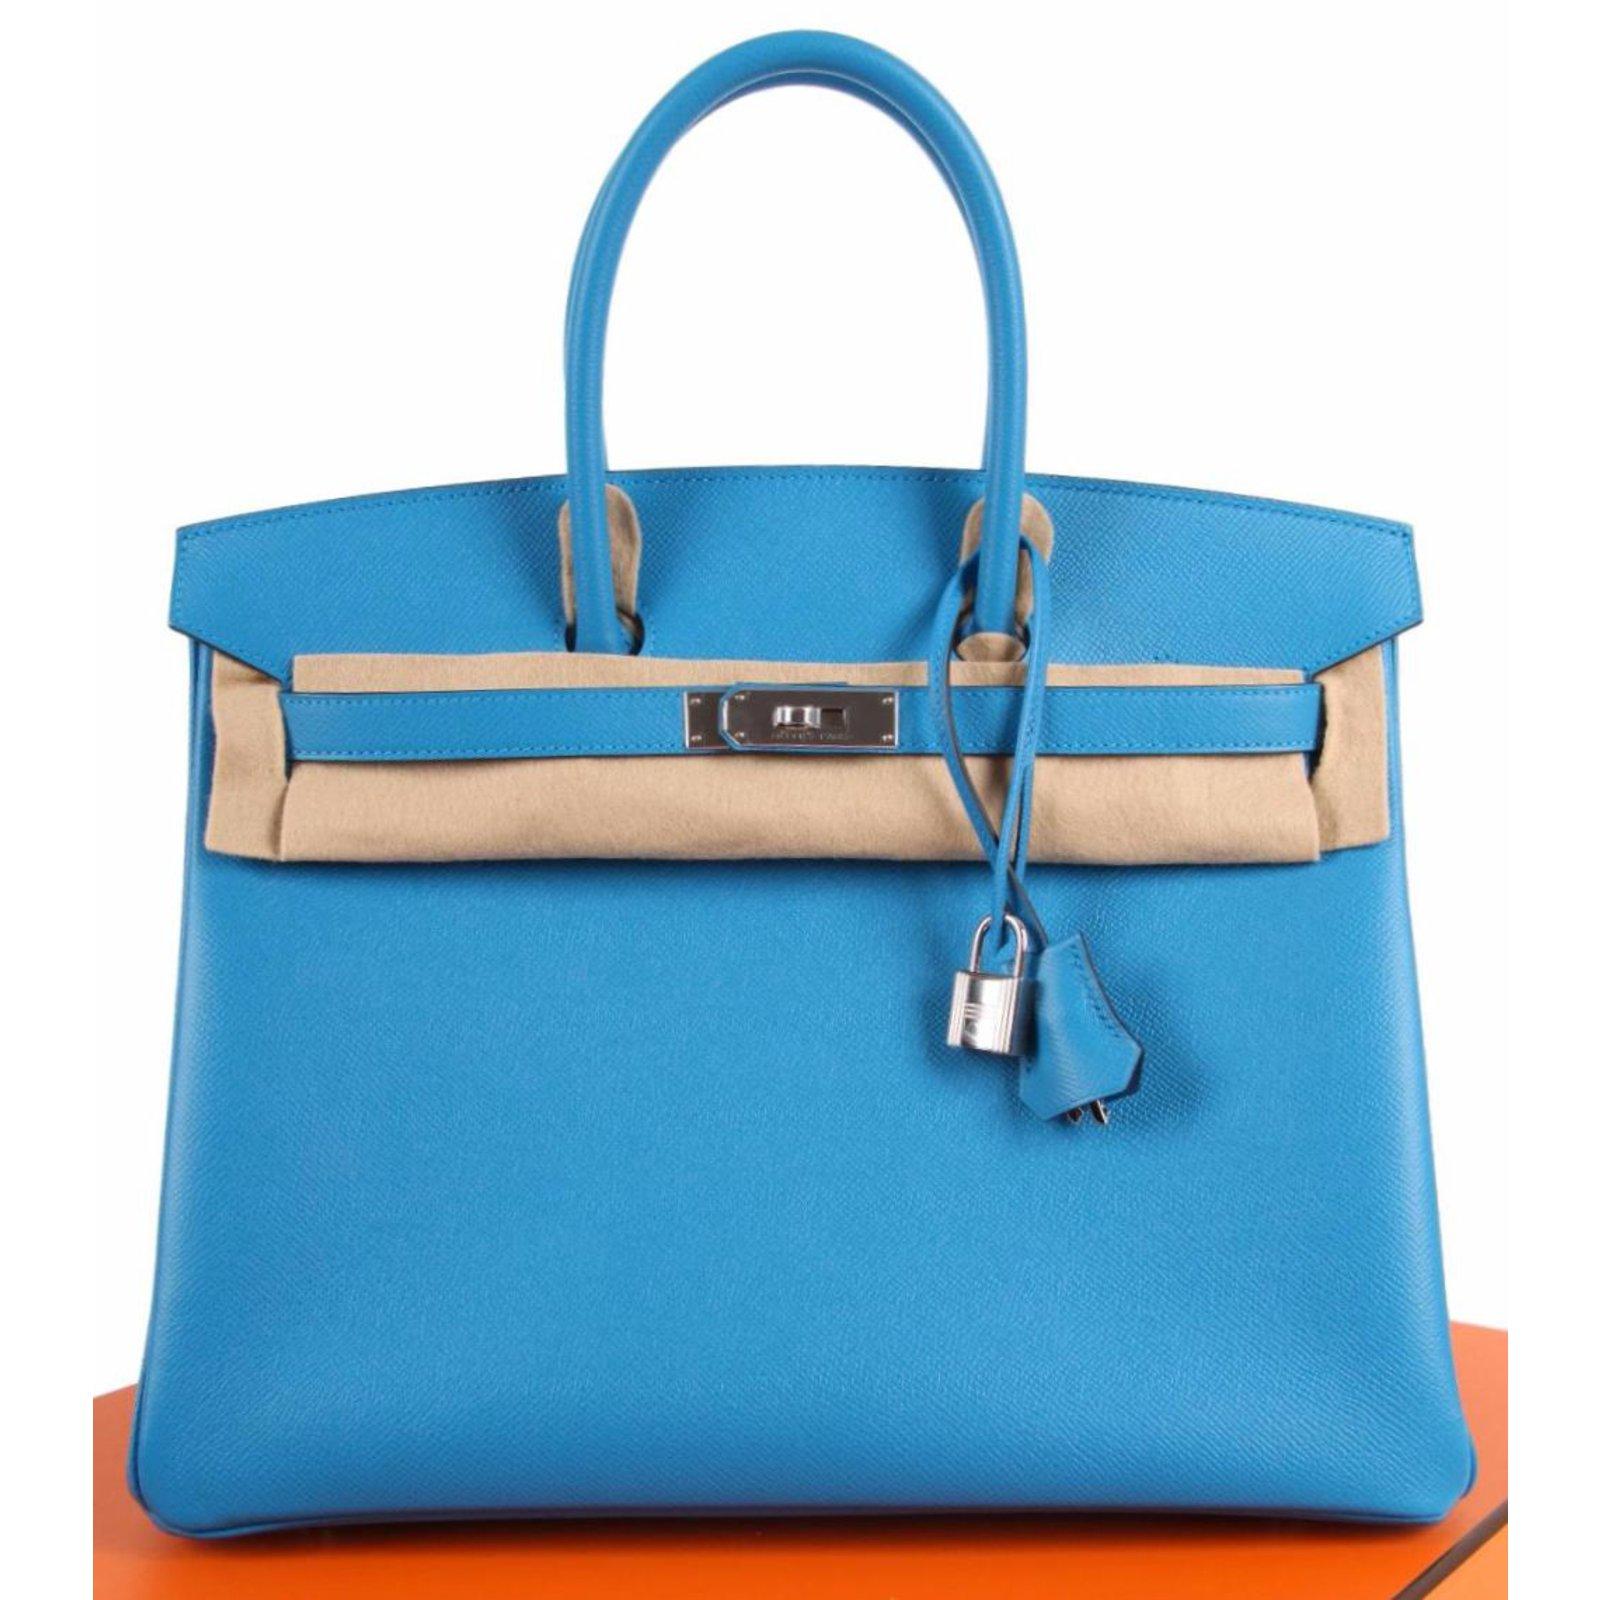 aec1ad5975 Sacs à main Hermès Birkin 35 Cuir Bleu ref.52901 - Joli Closet